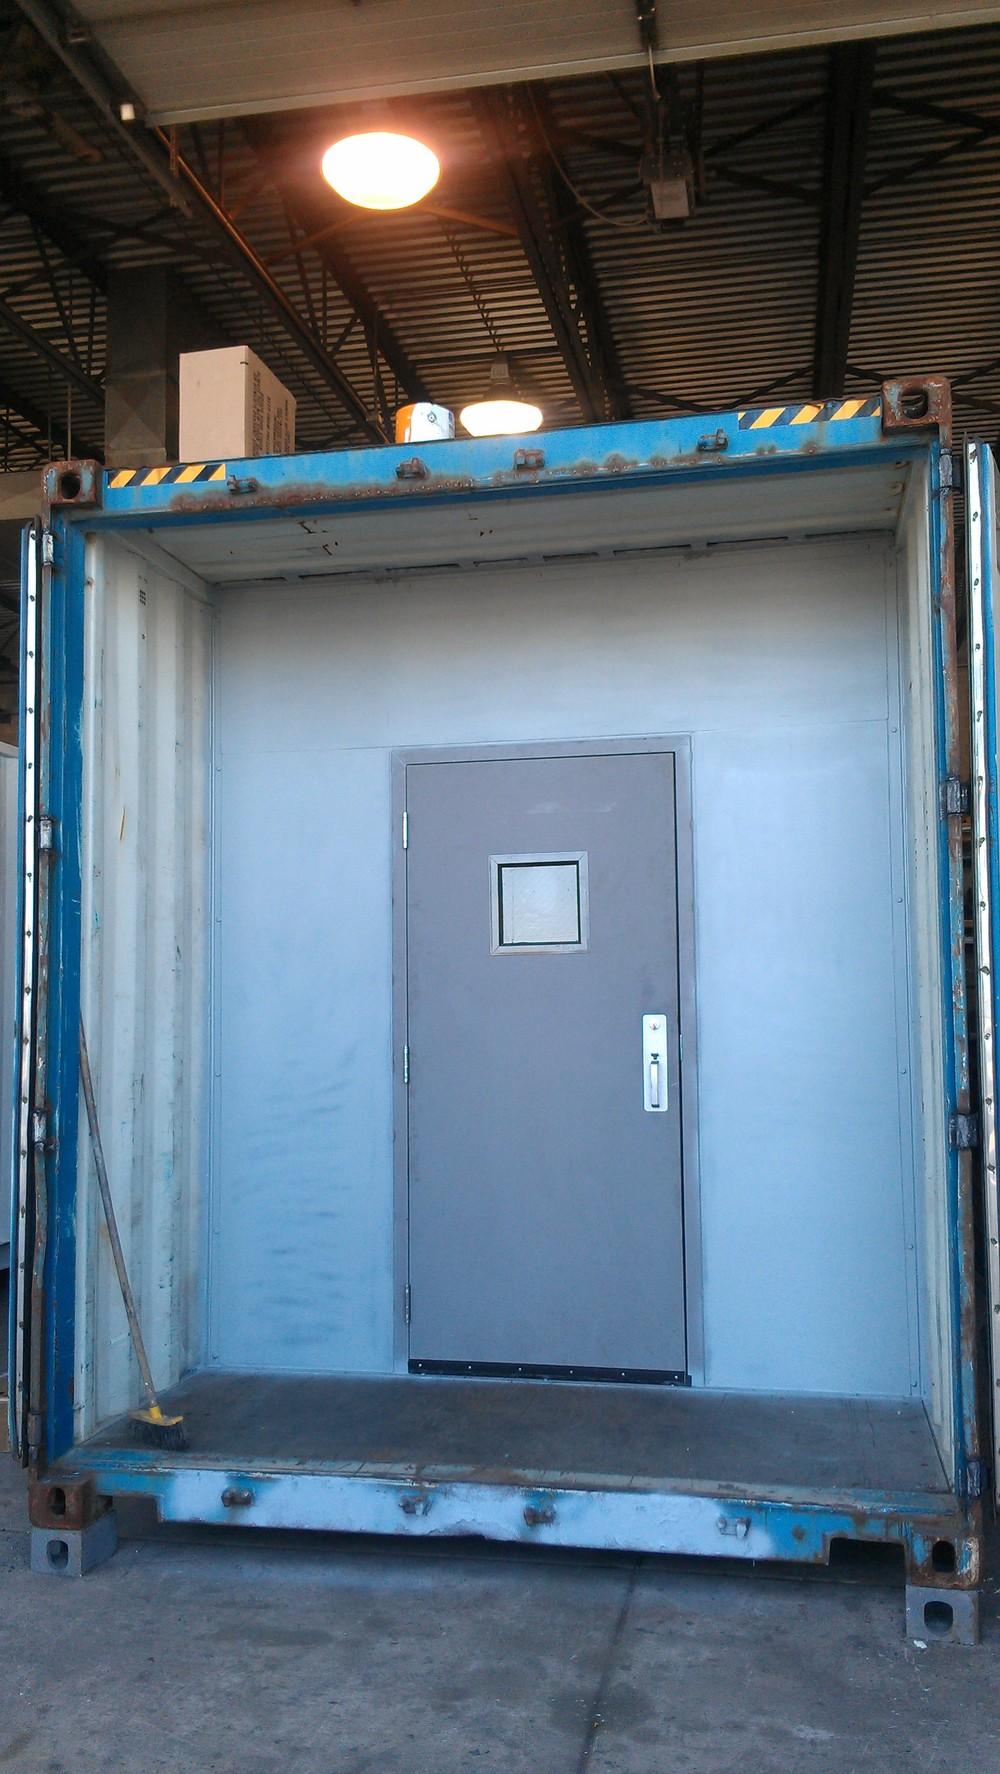 Partition with man-door